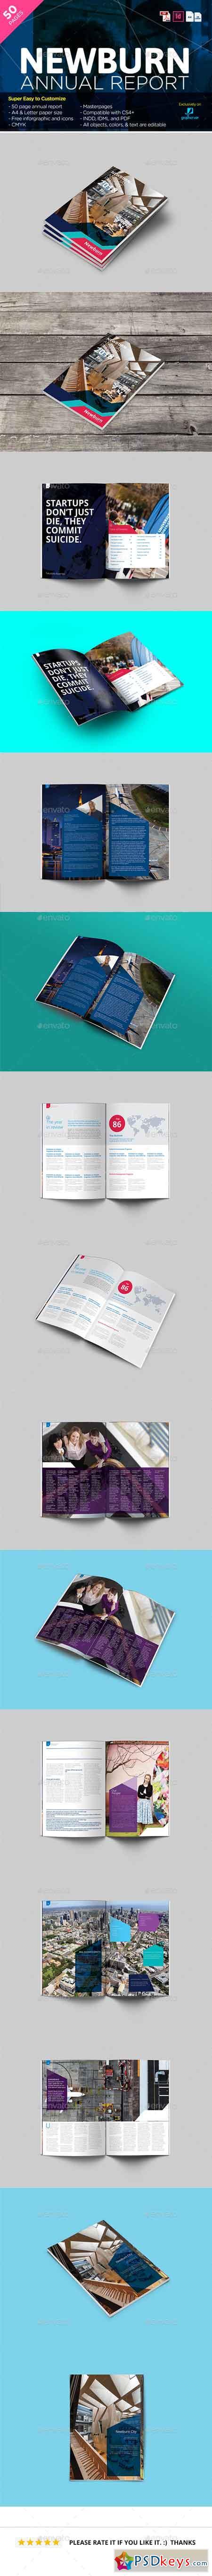 Newburn Modern Annual Report 20151139